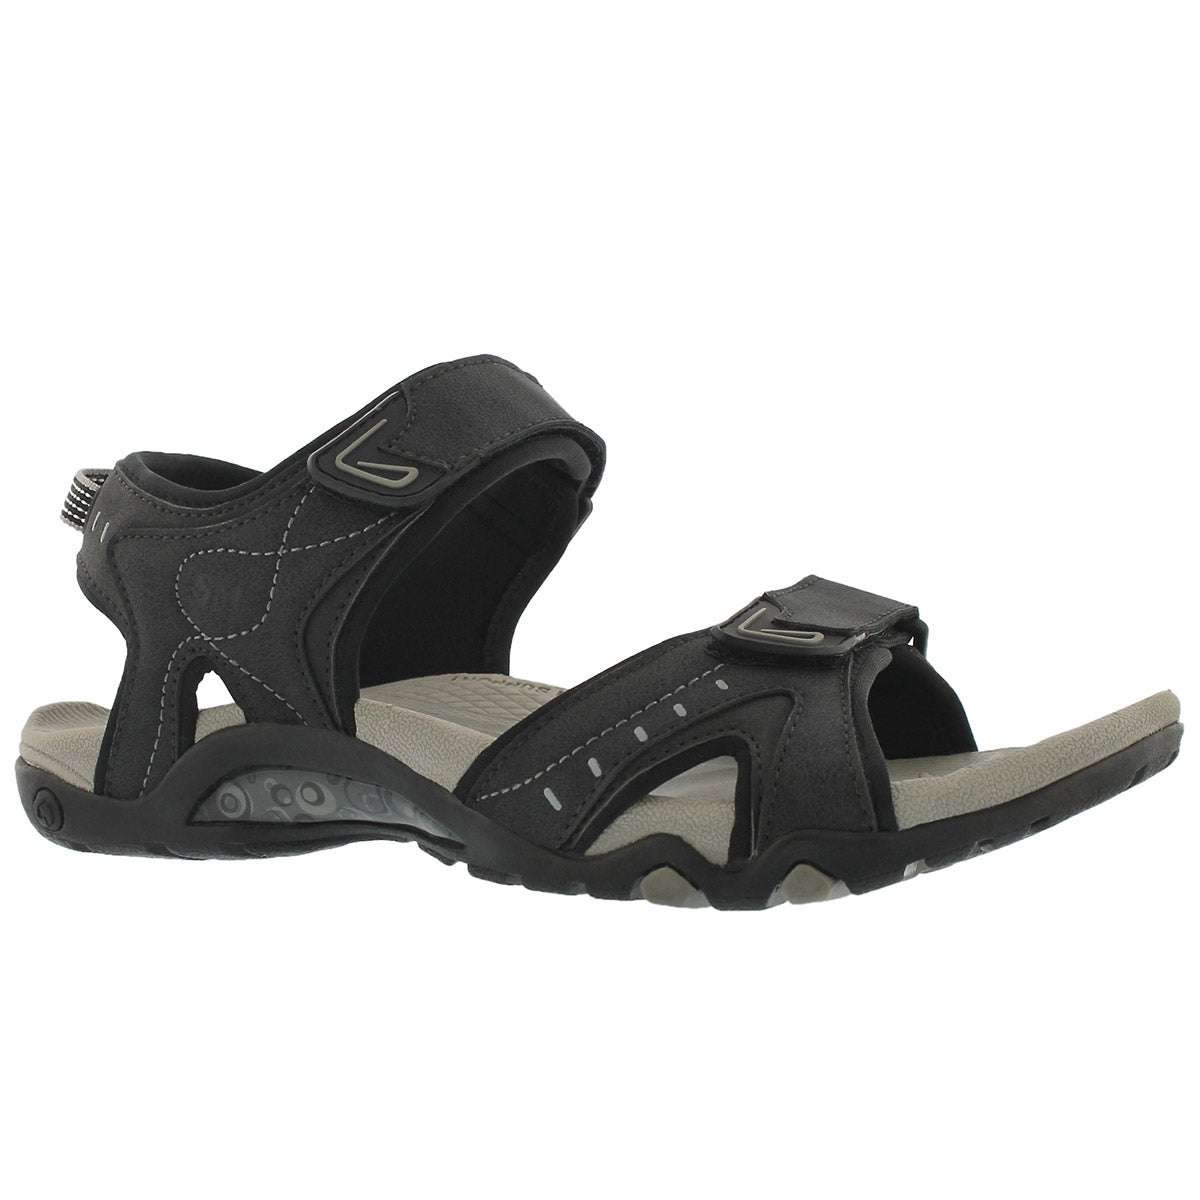 Men's KEITH black 3 strap sport sandals